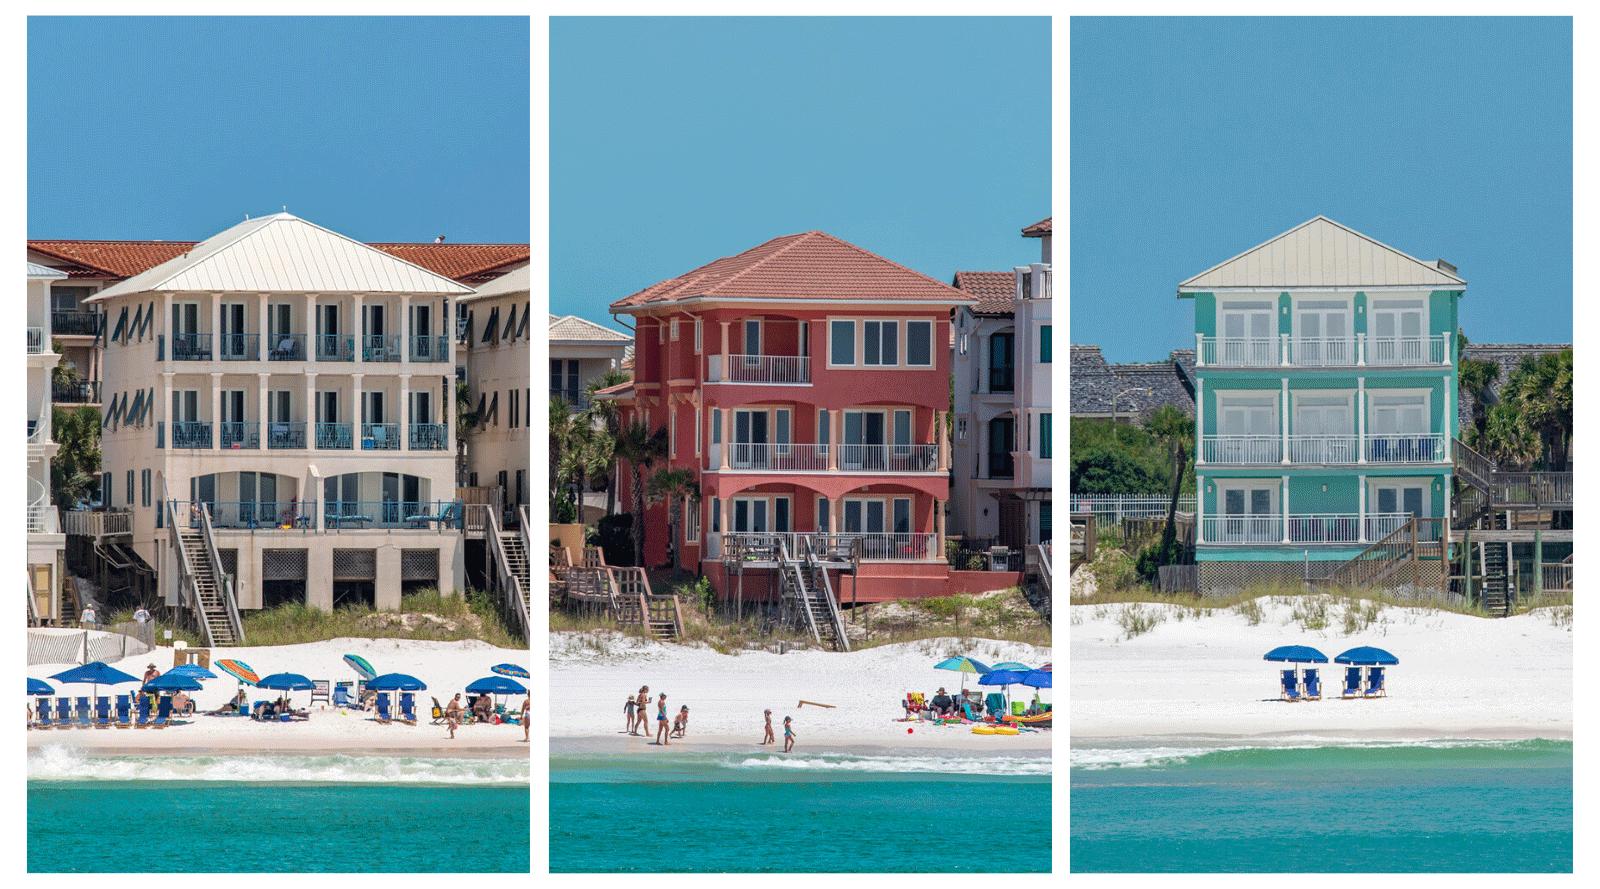 New Beachfront Vacation Homes in Destin